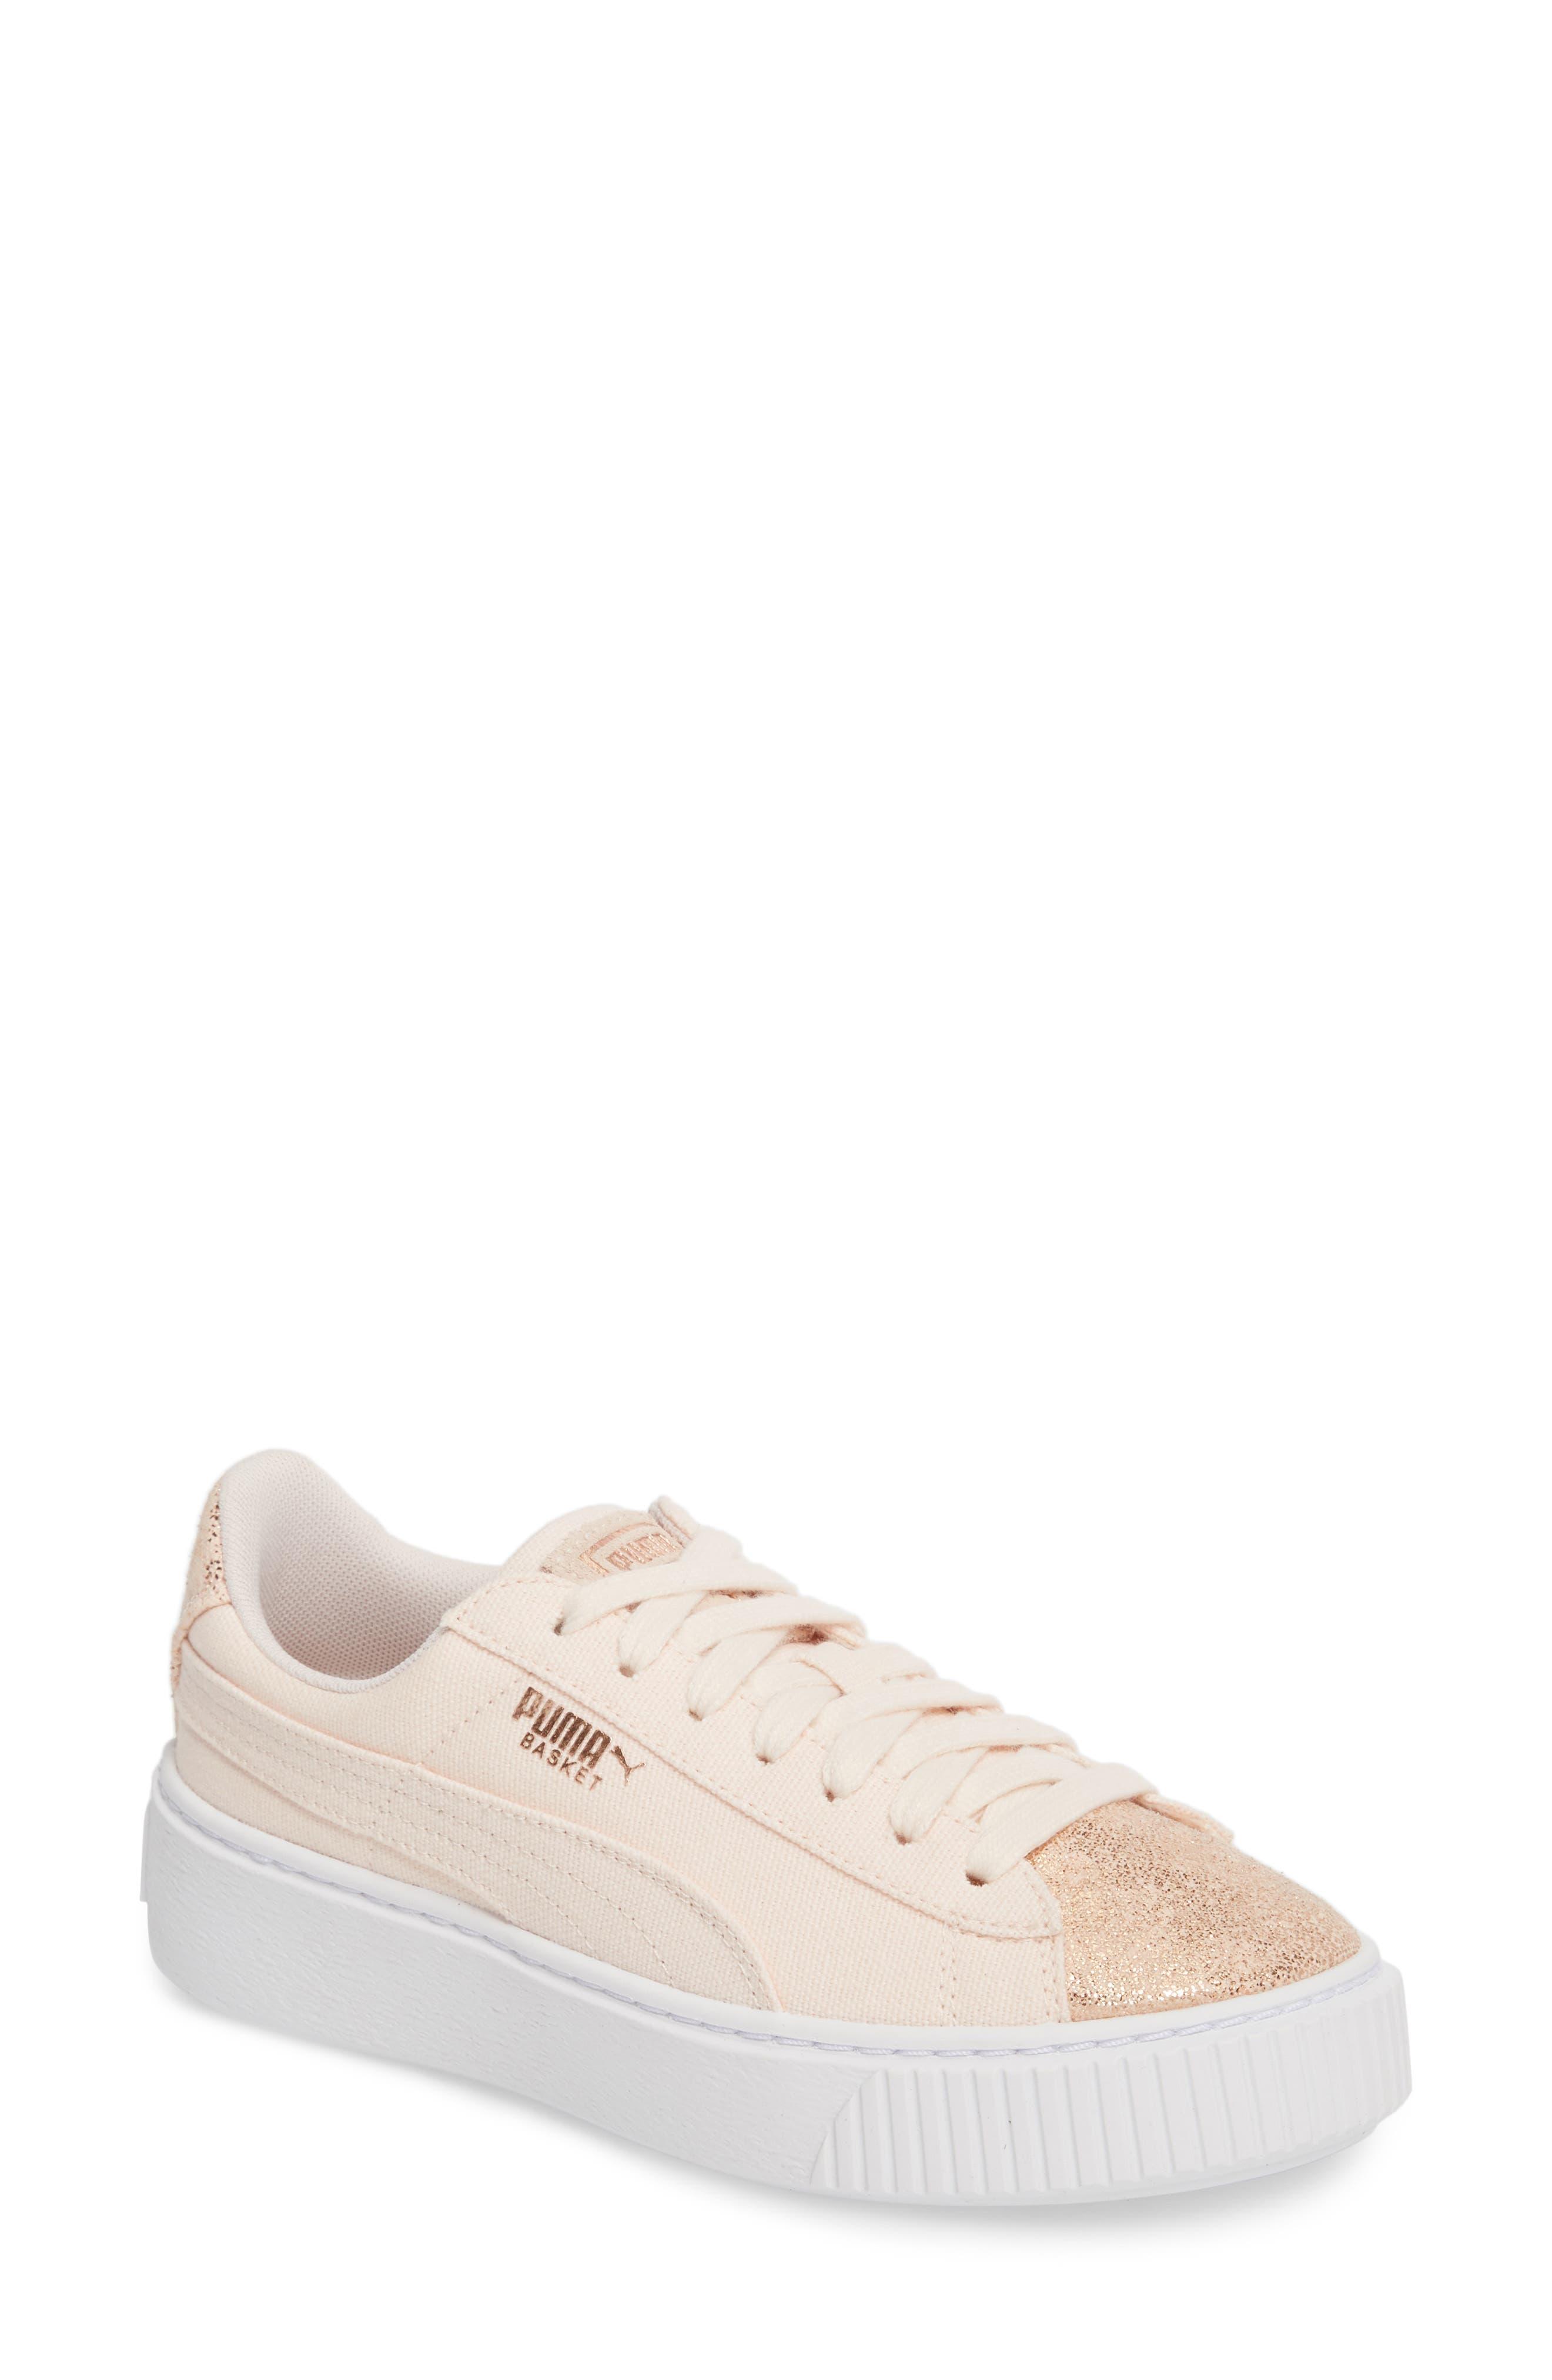 Basket Platform Sneaker,                             Main thumbnail 1, color,                             Pearl/ Rose Gold